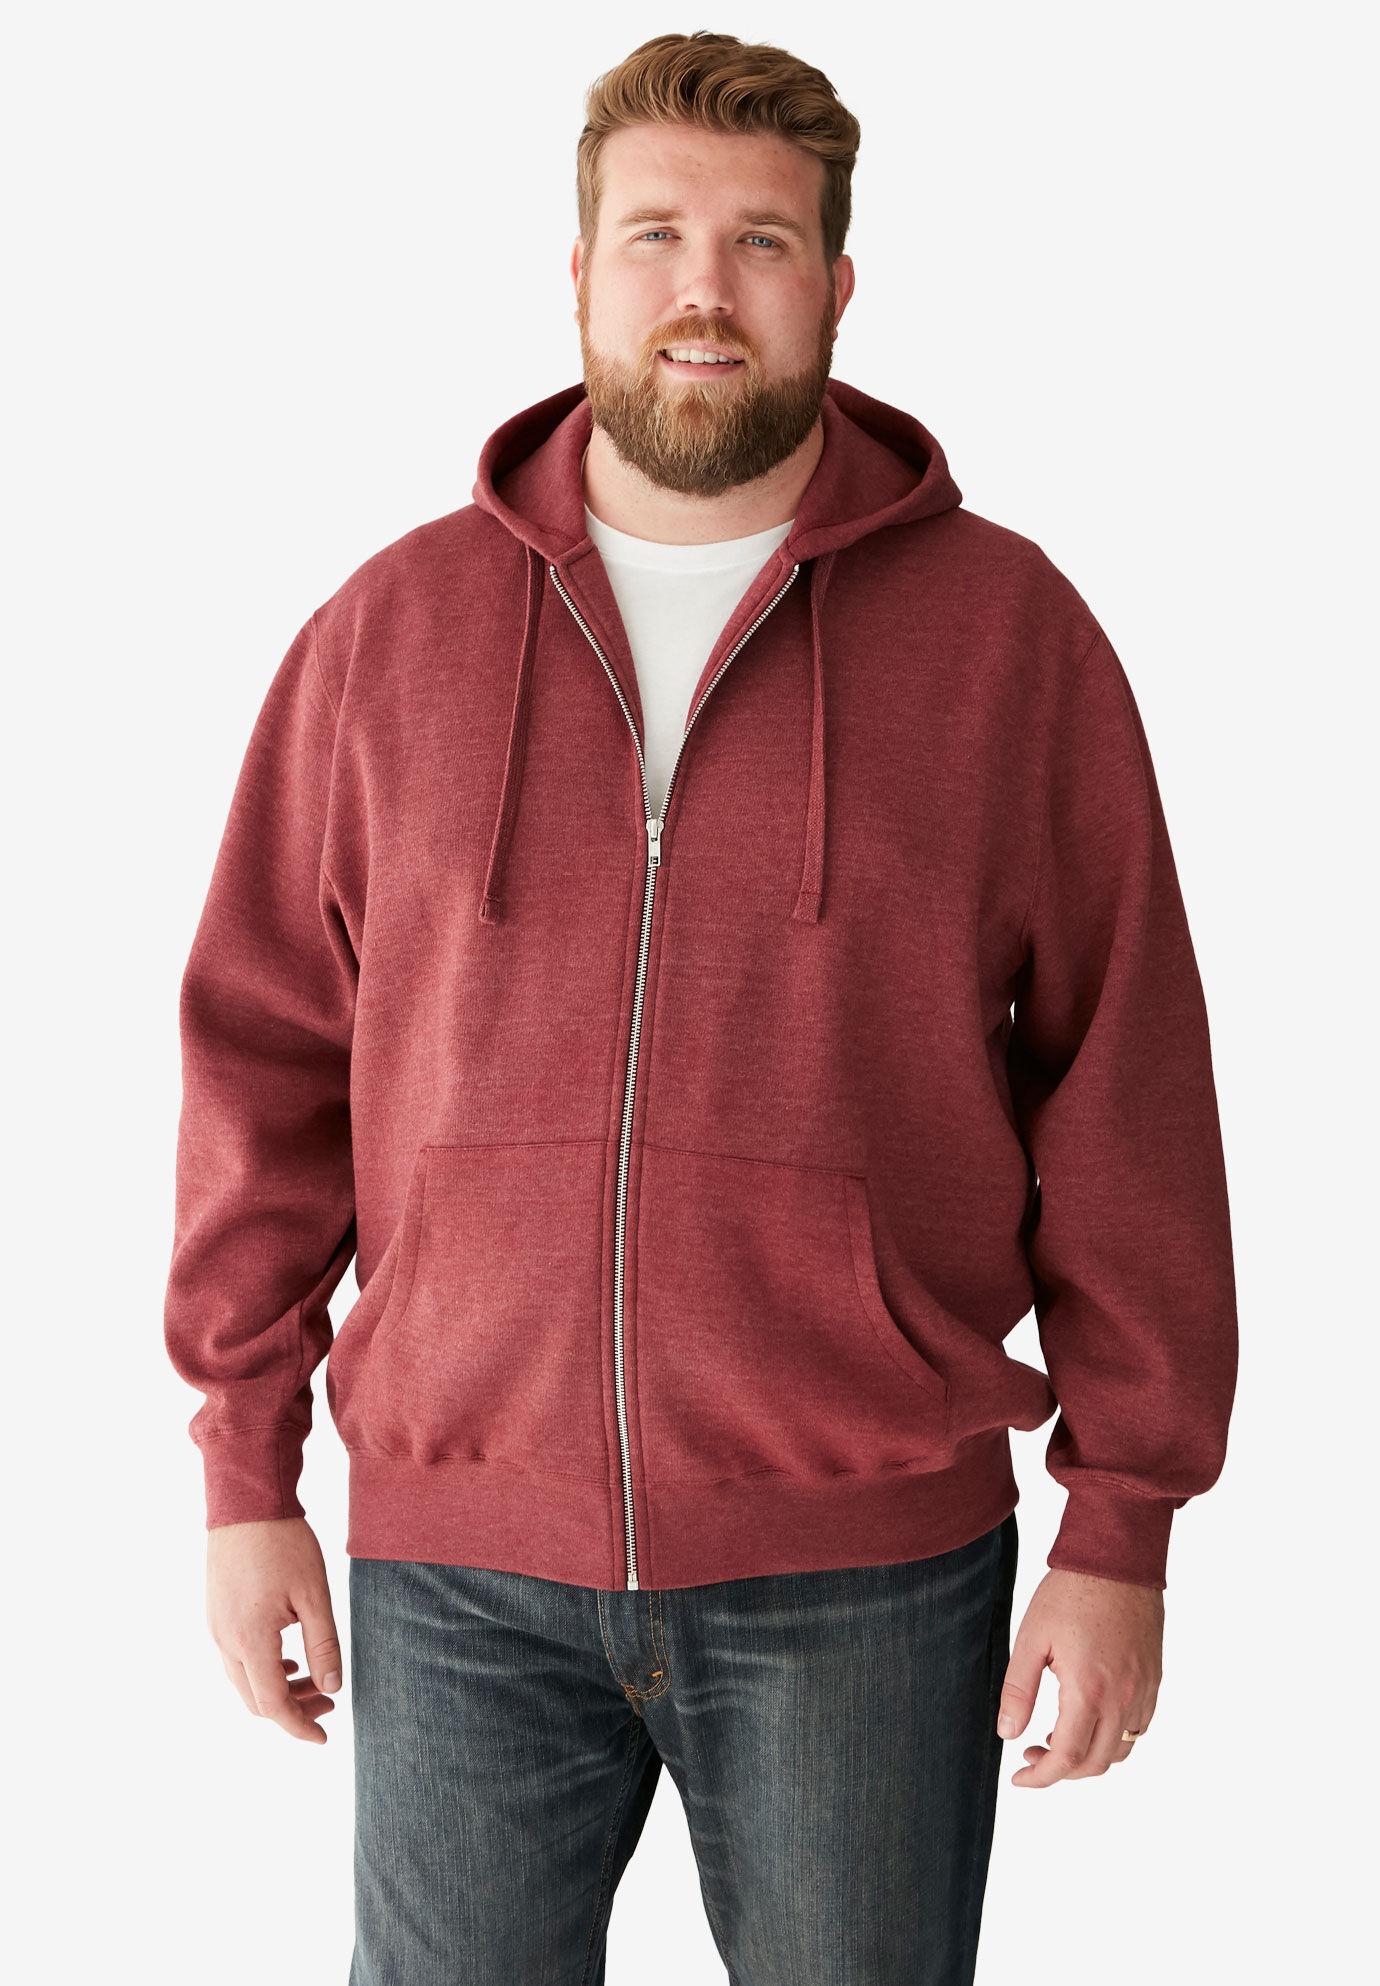 Big and tall sweatshirt for men us Army sweatshirt hoodie tall size